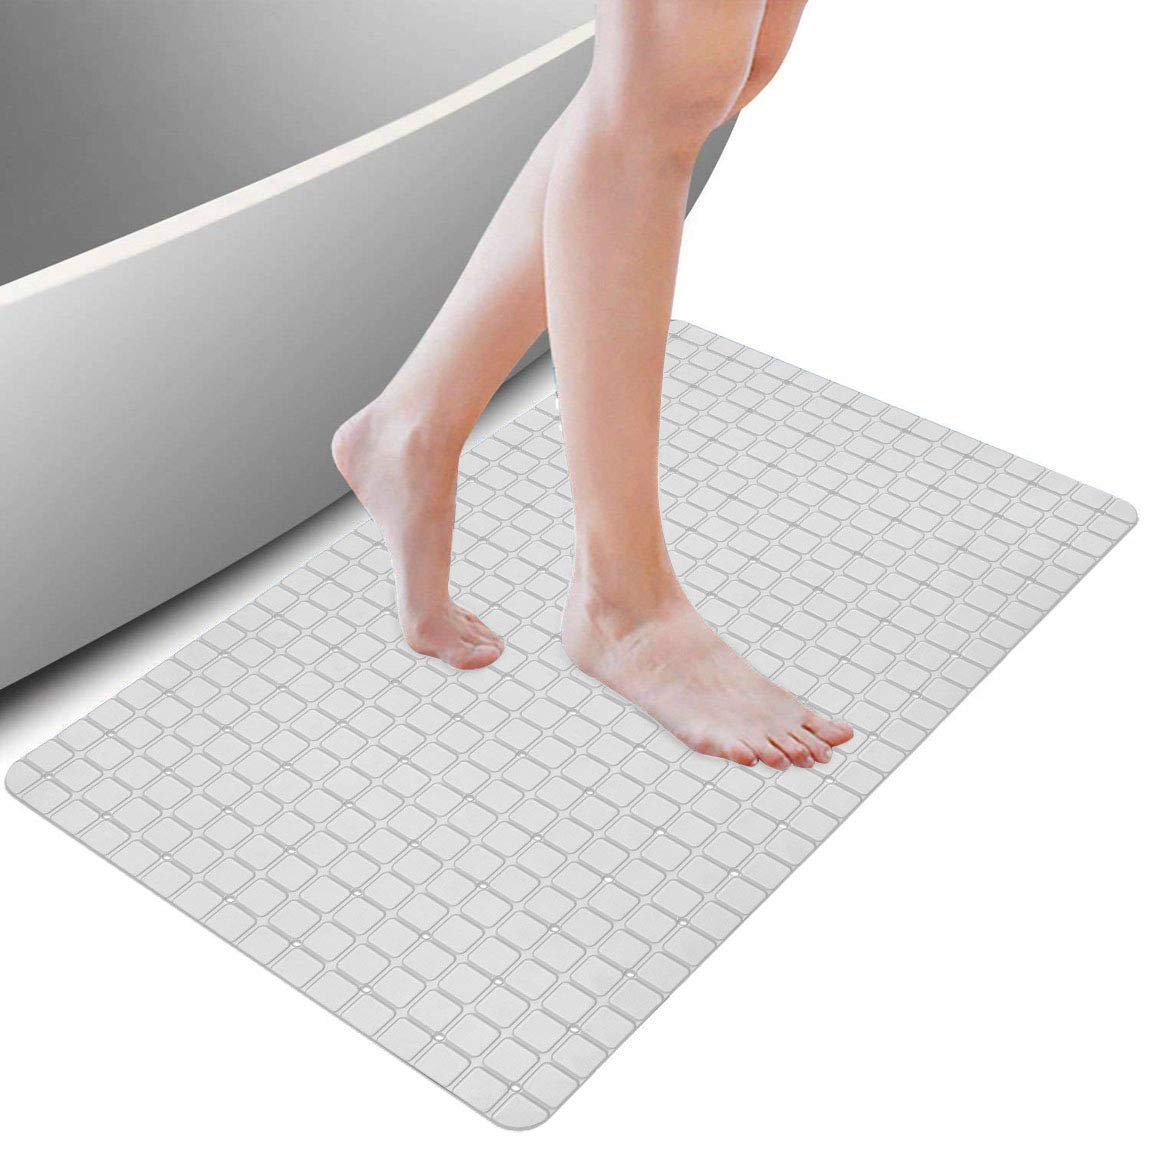 XIYUNTE Bath Mat Shower Safety Mats - Extra Long Non-Slip Bathtub Mats with Drain Holes (New-White)